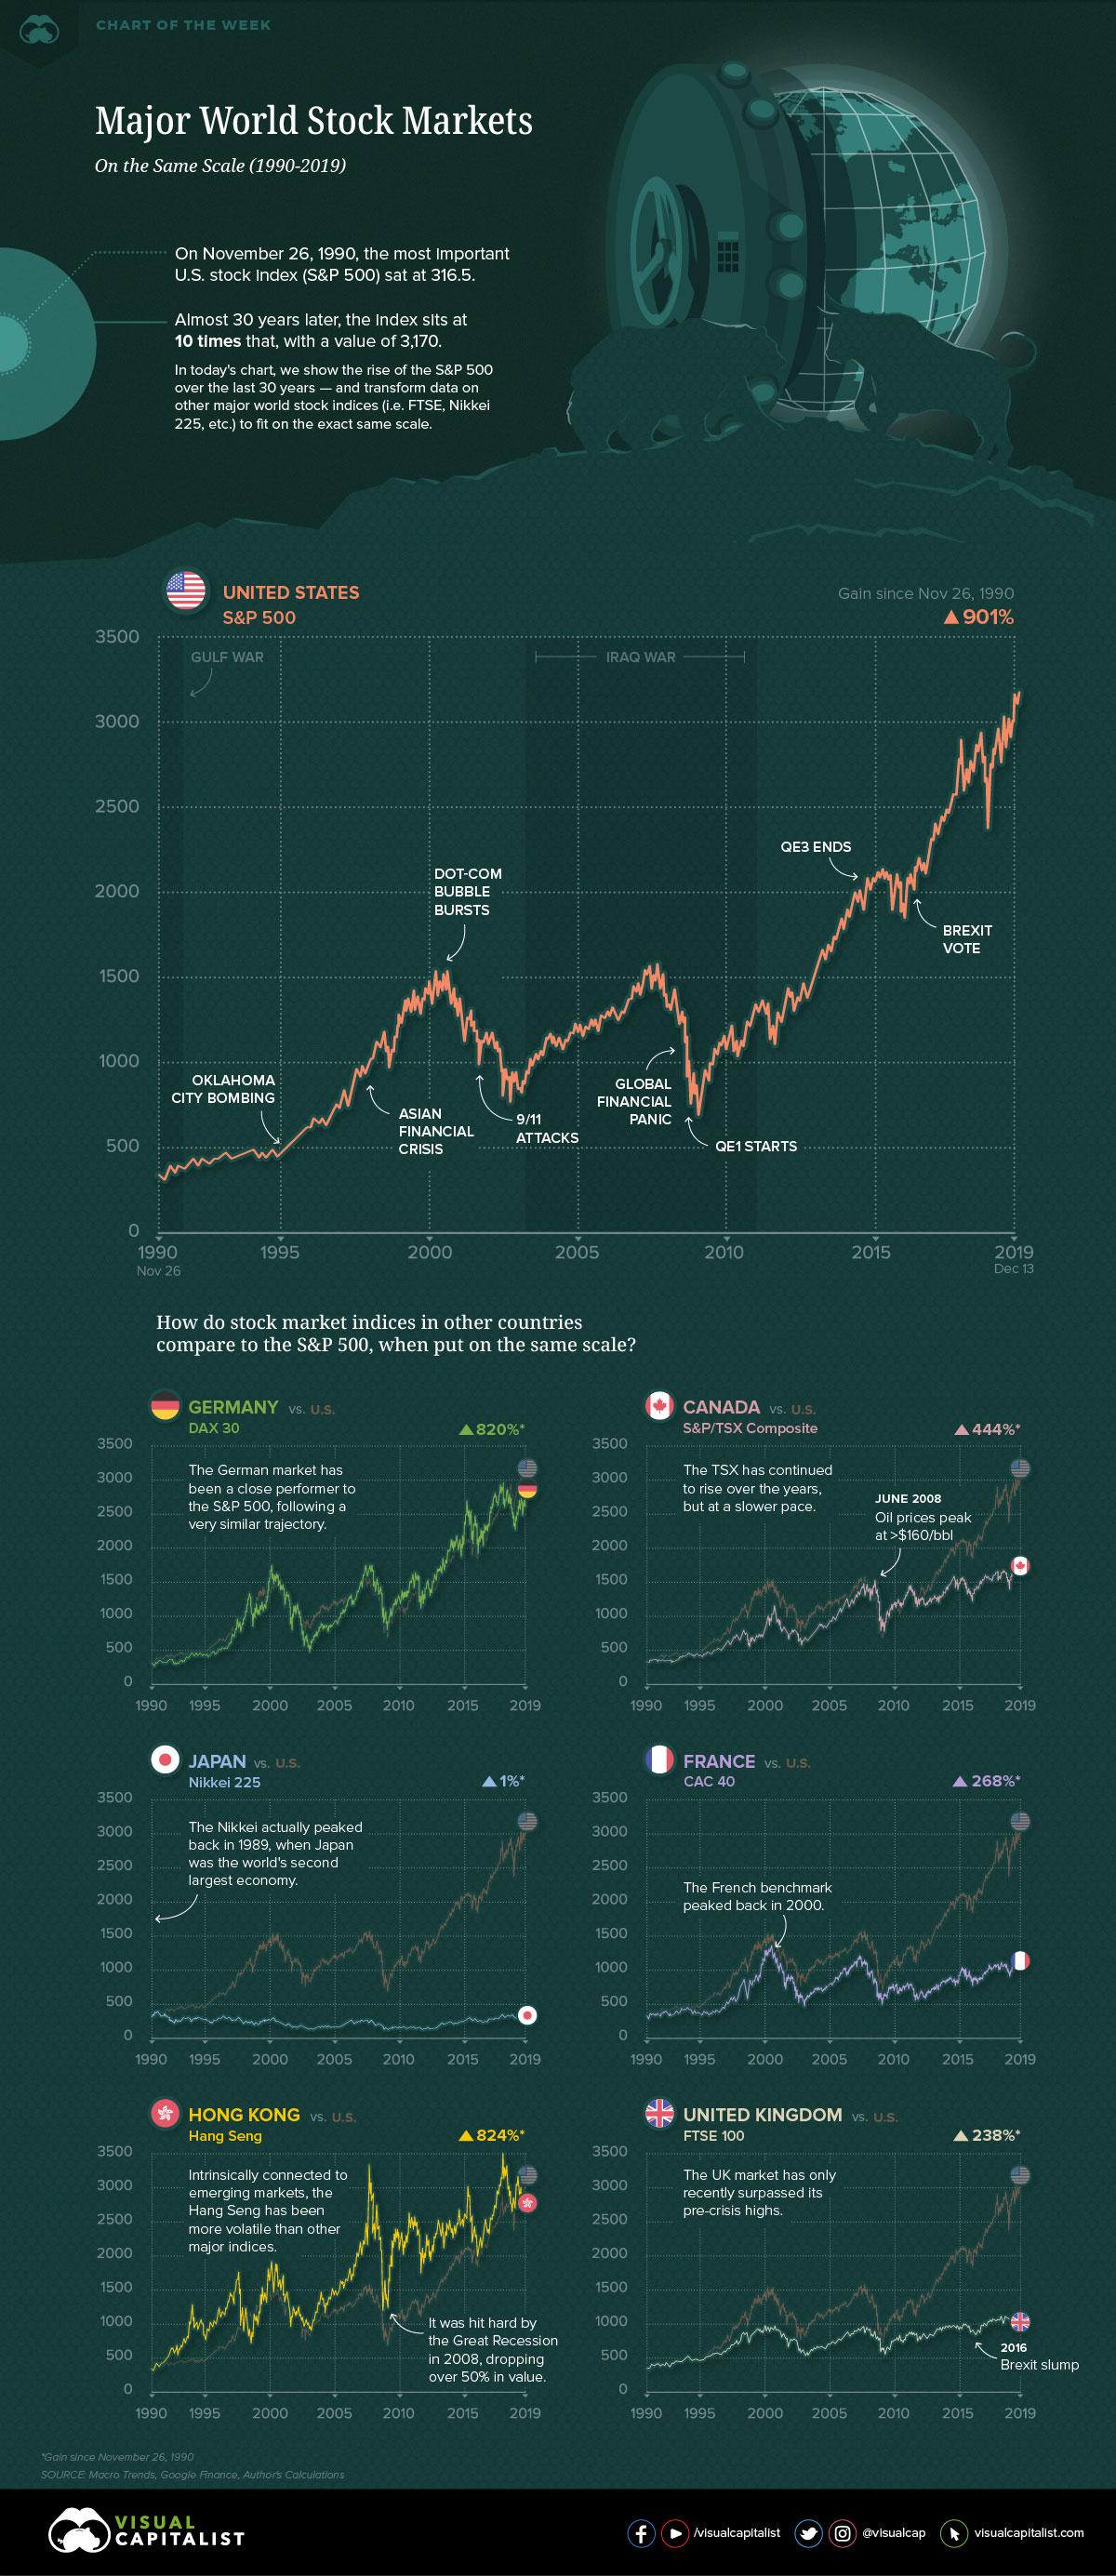 world-major-stock-markets-compared-sp500